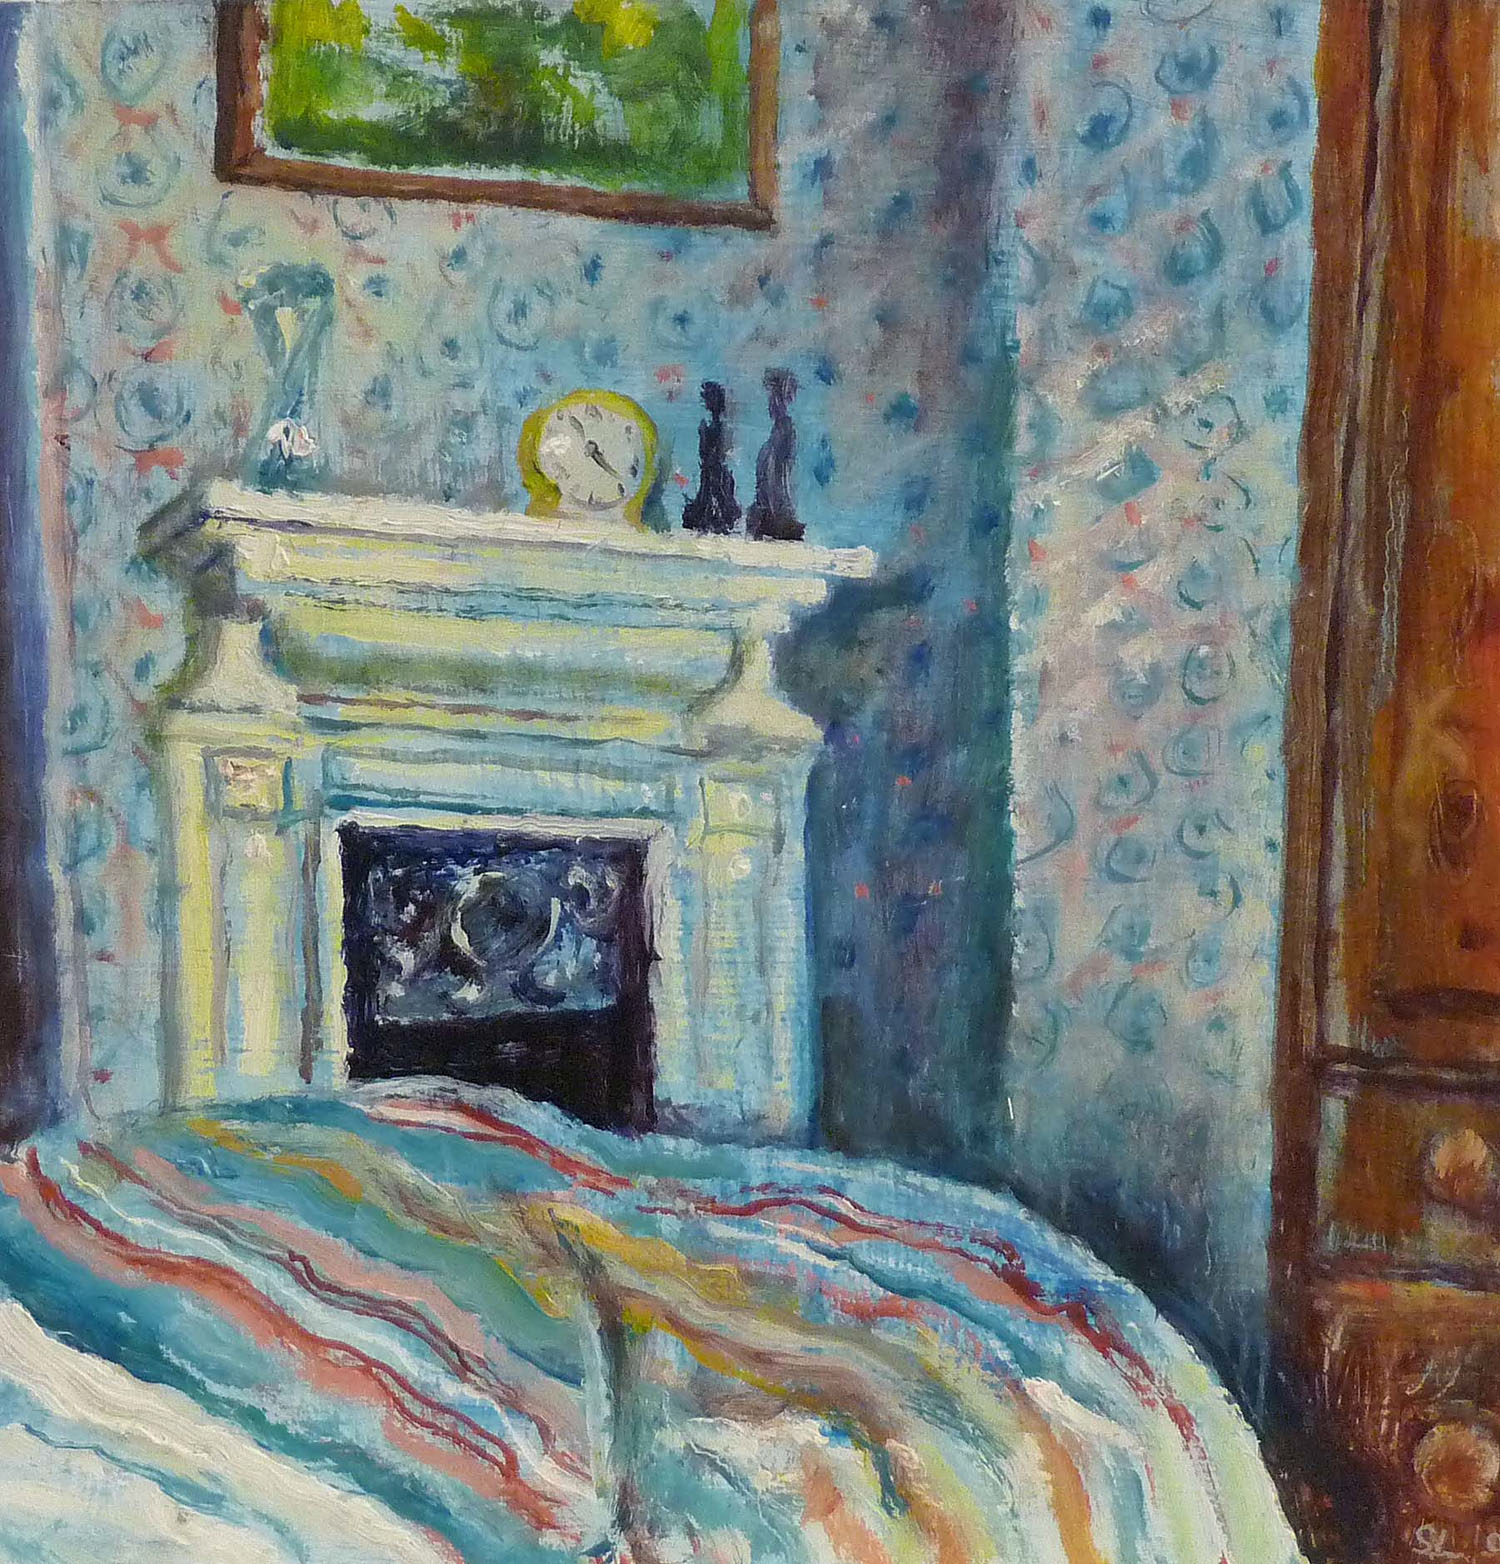 Sarah Longley_-_Spare Bedroom, Arran_oil on board_29 x 29cm.jpg